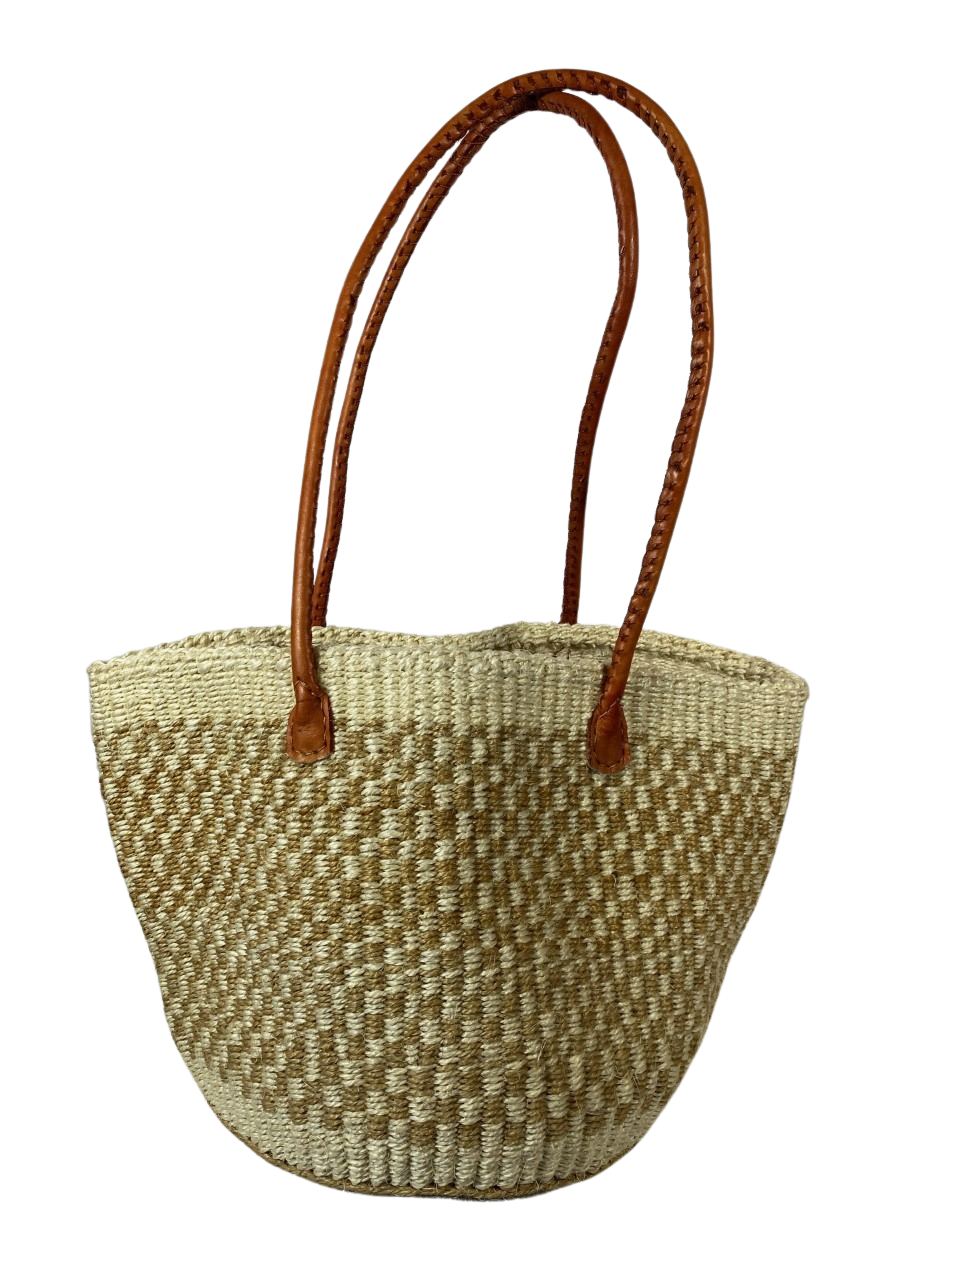 Tote Basket - Beige & White Checkered